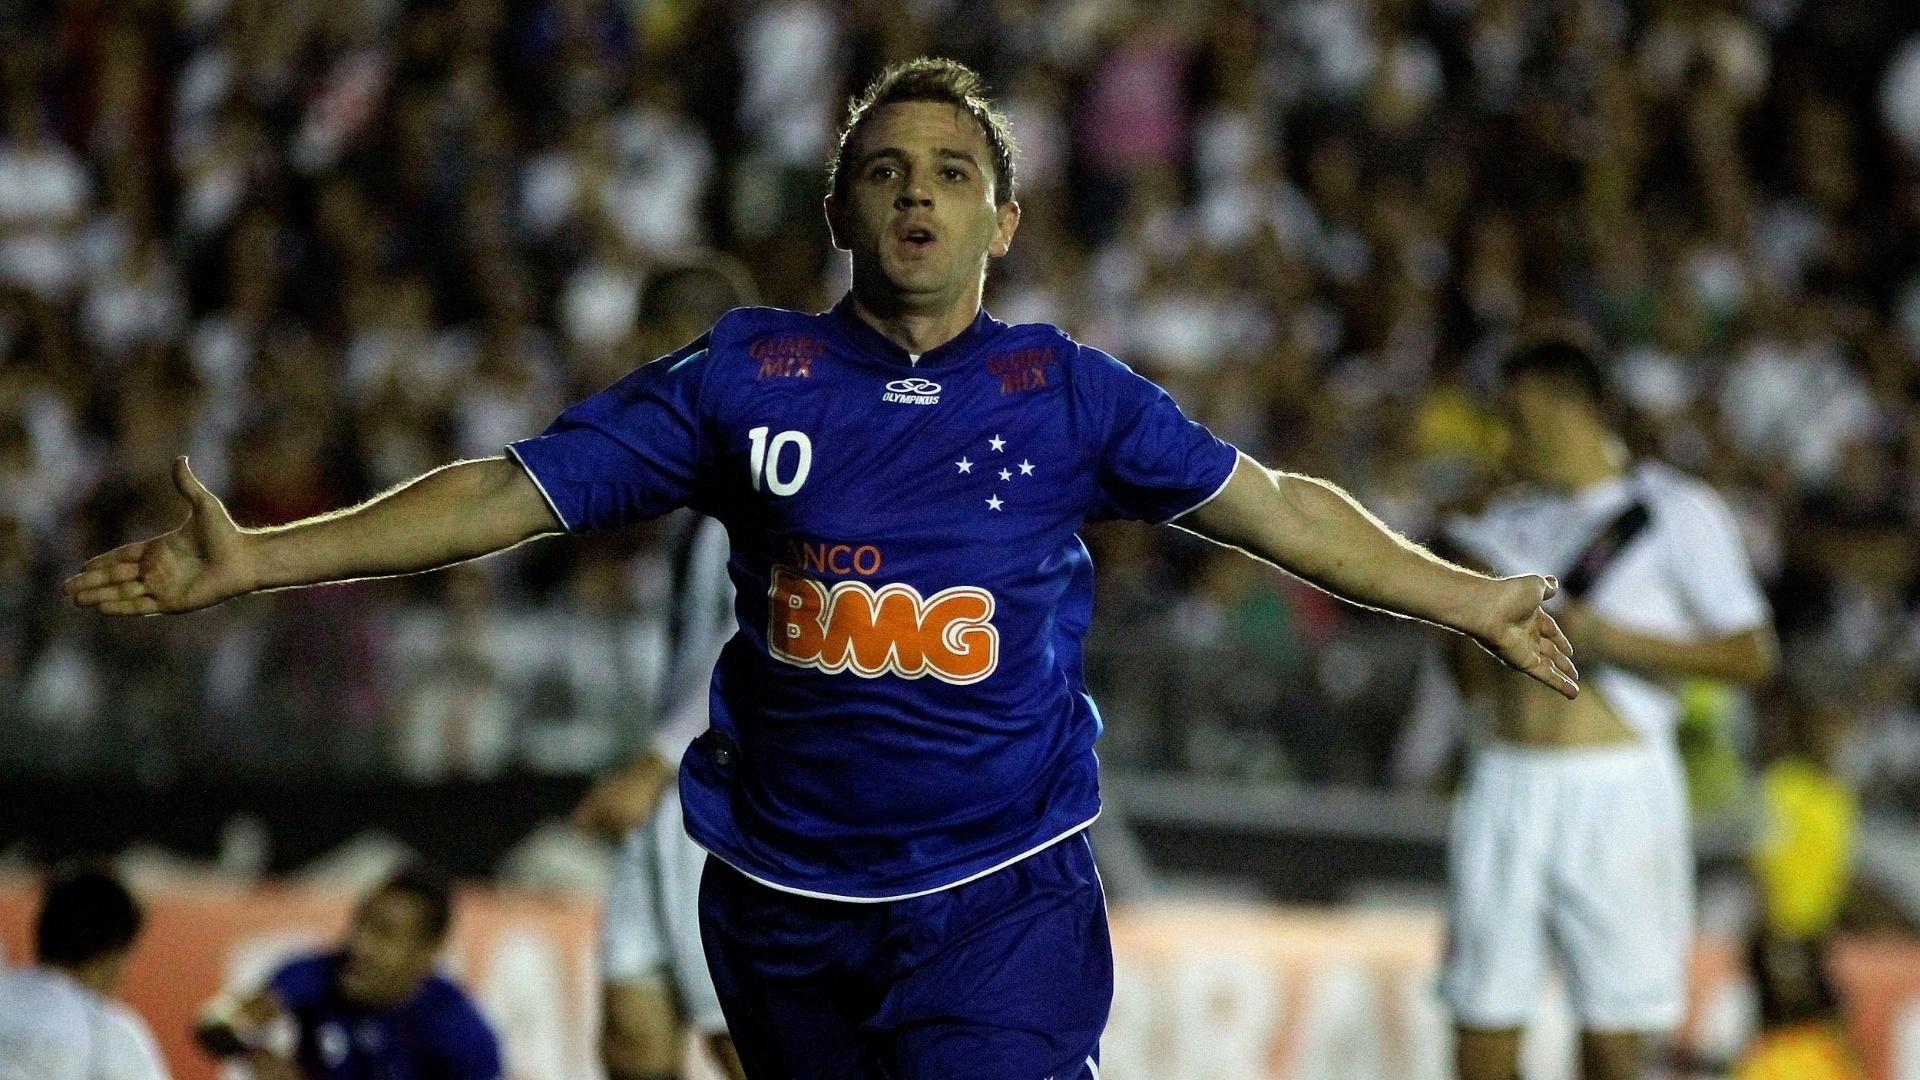 Montillo comemora após fazer o primeiro gol do Cruzeiro contra o Vasco (23/06/2012)